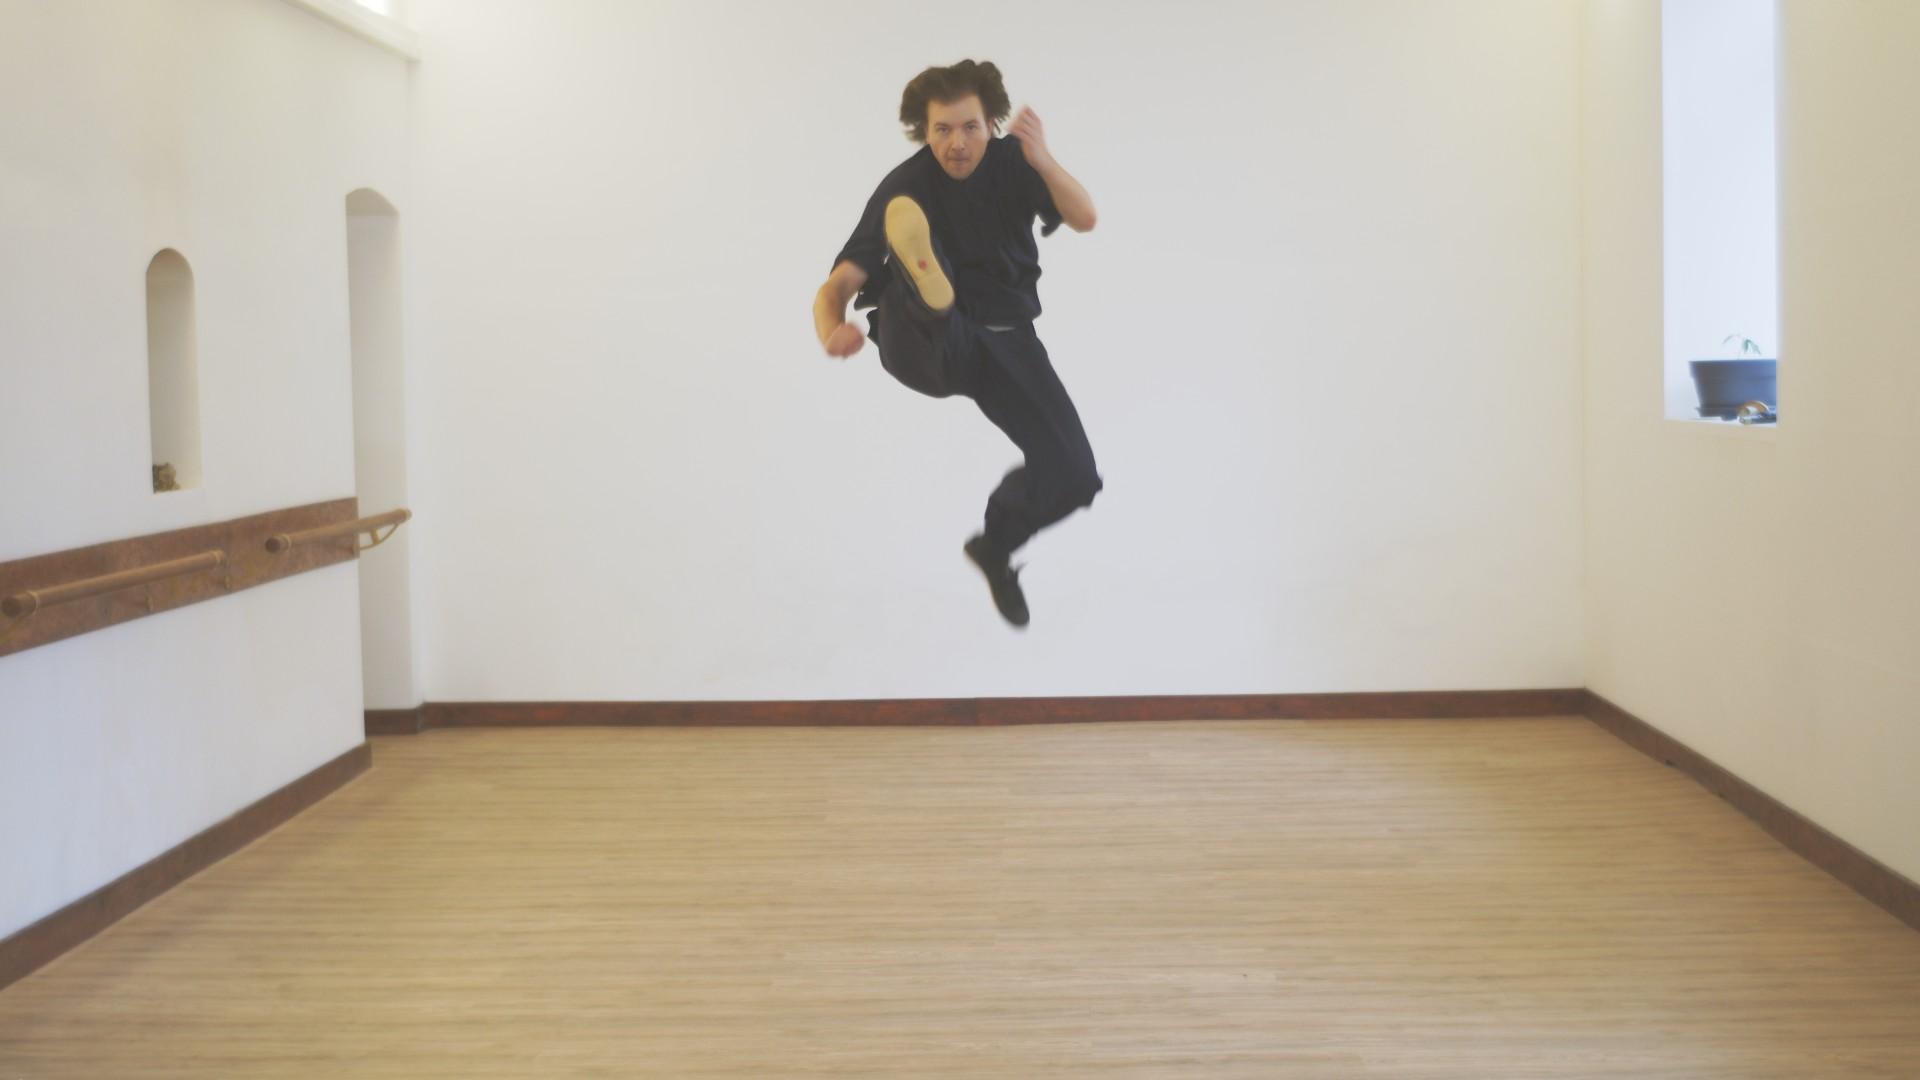 Jibenquan – Jumping Power – Part 4